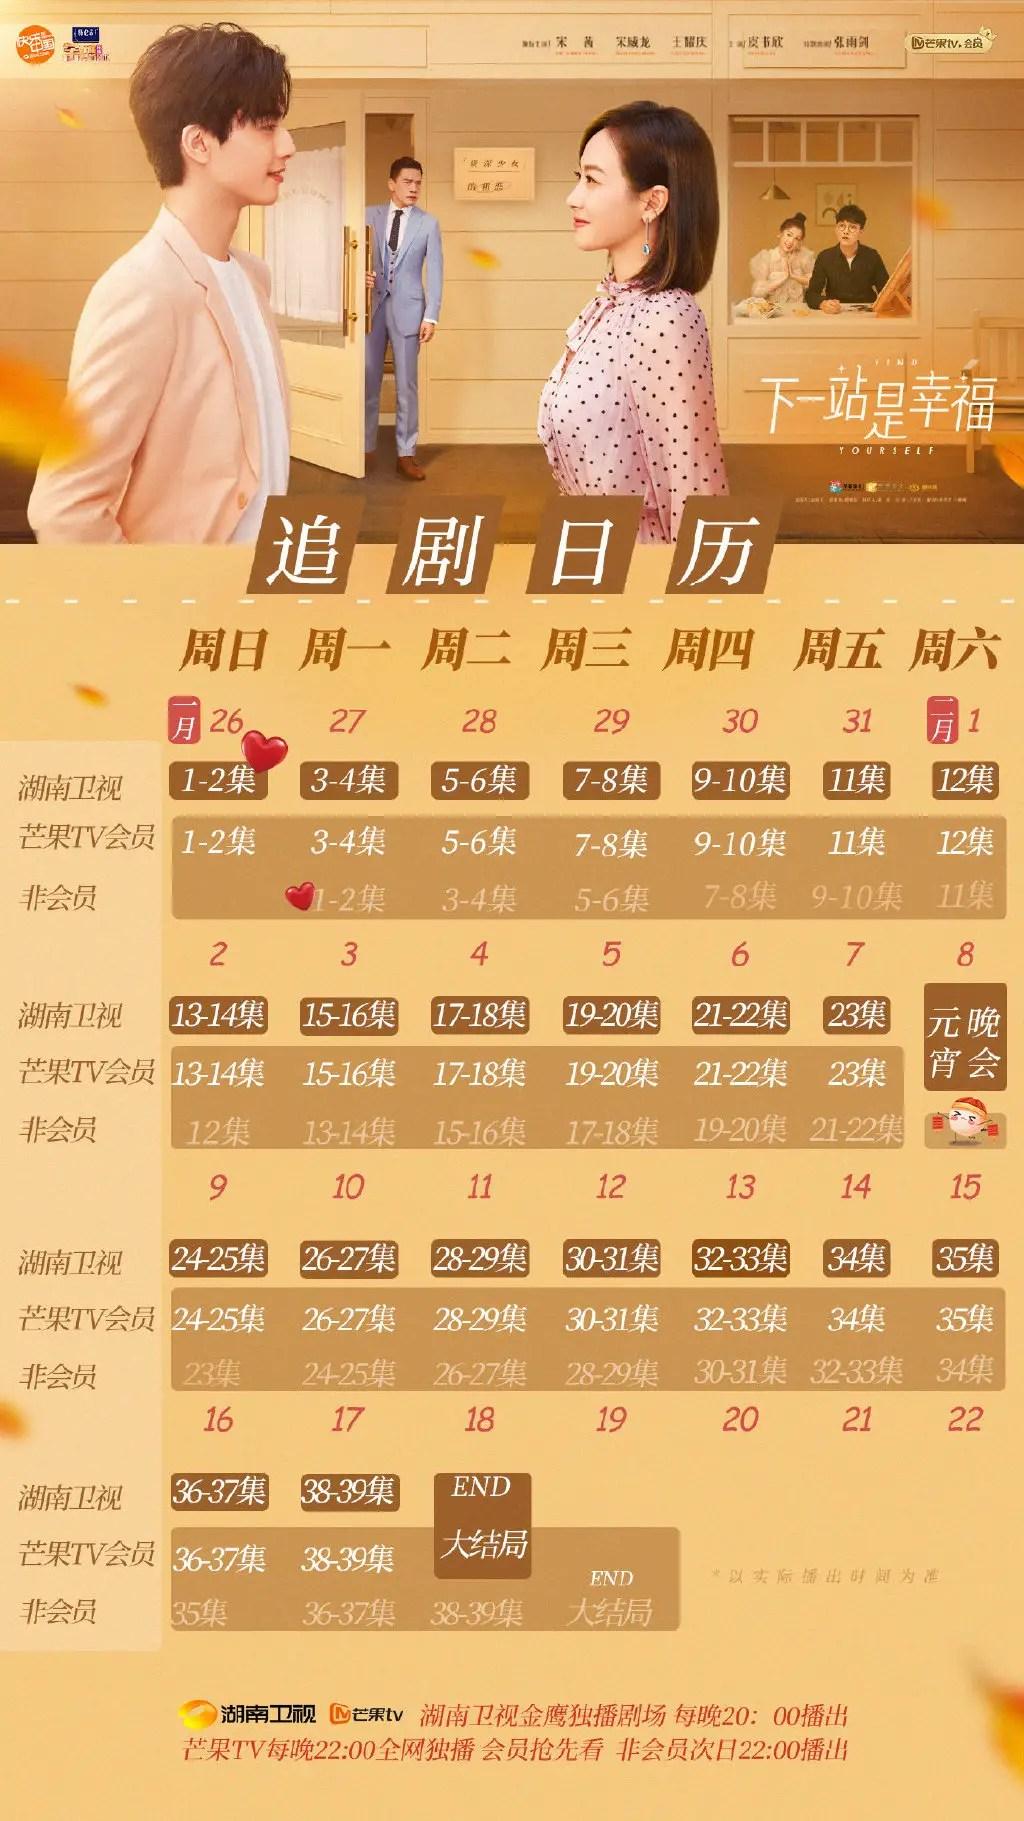 Find Yourself Drama Airing Calendar